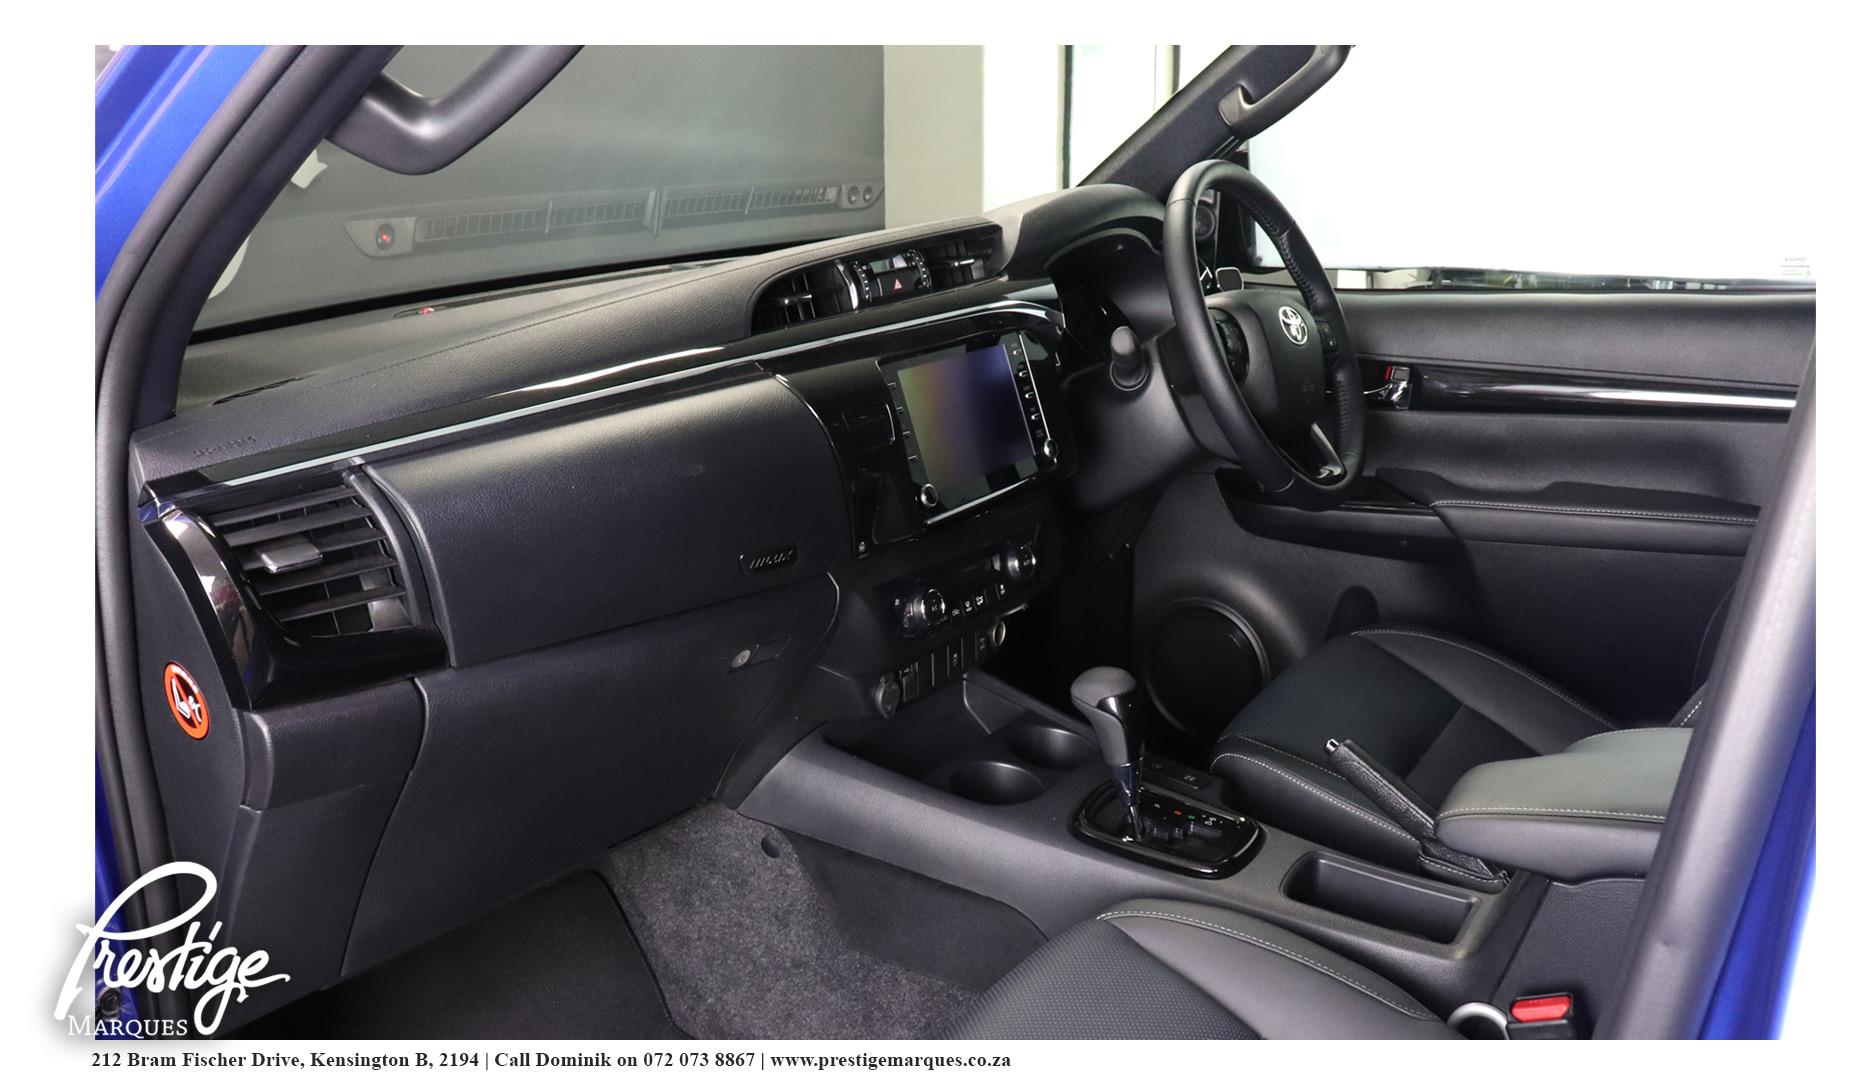 2020-Toyota-Hilux-2X2-50-Legened-Auto-Prestige-Marques-Randburg-Sandton12